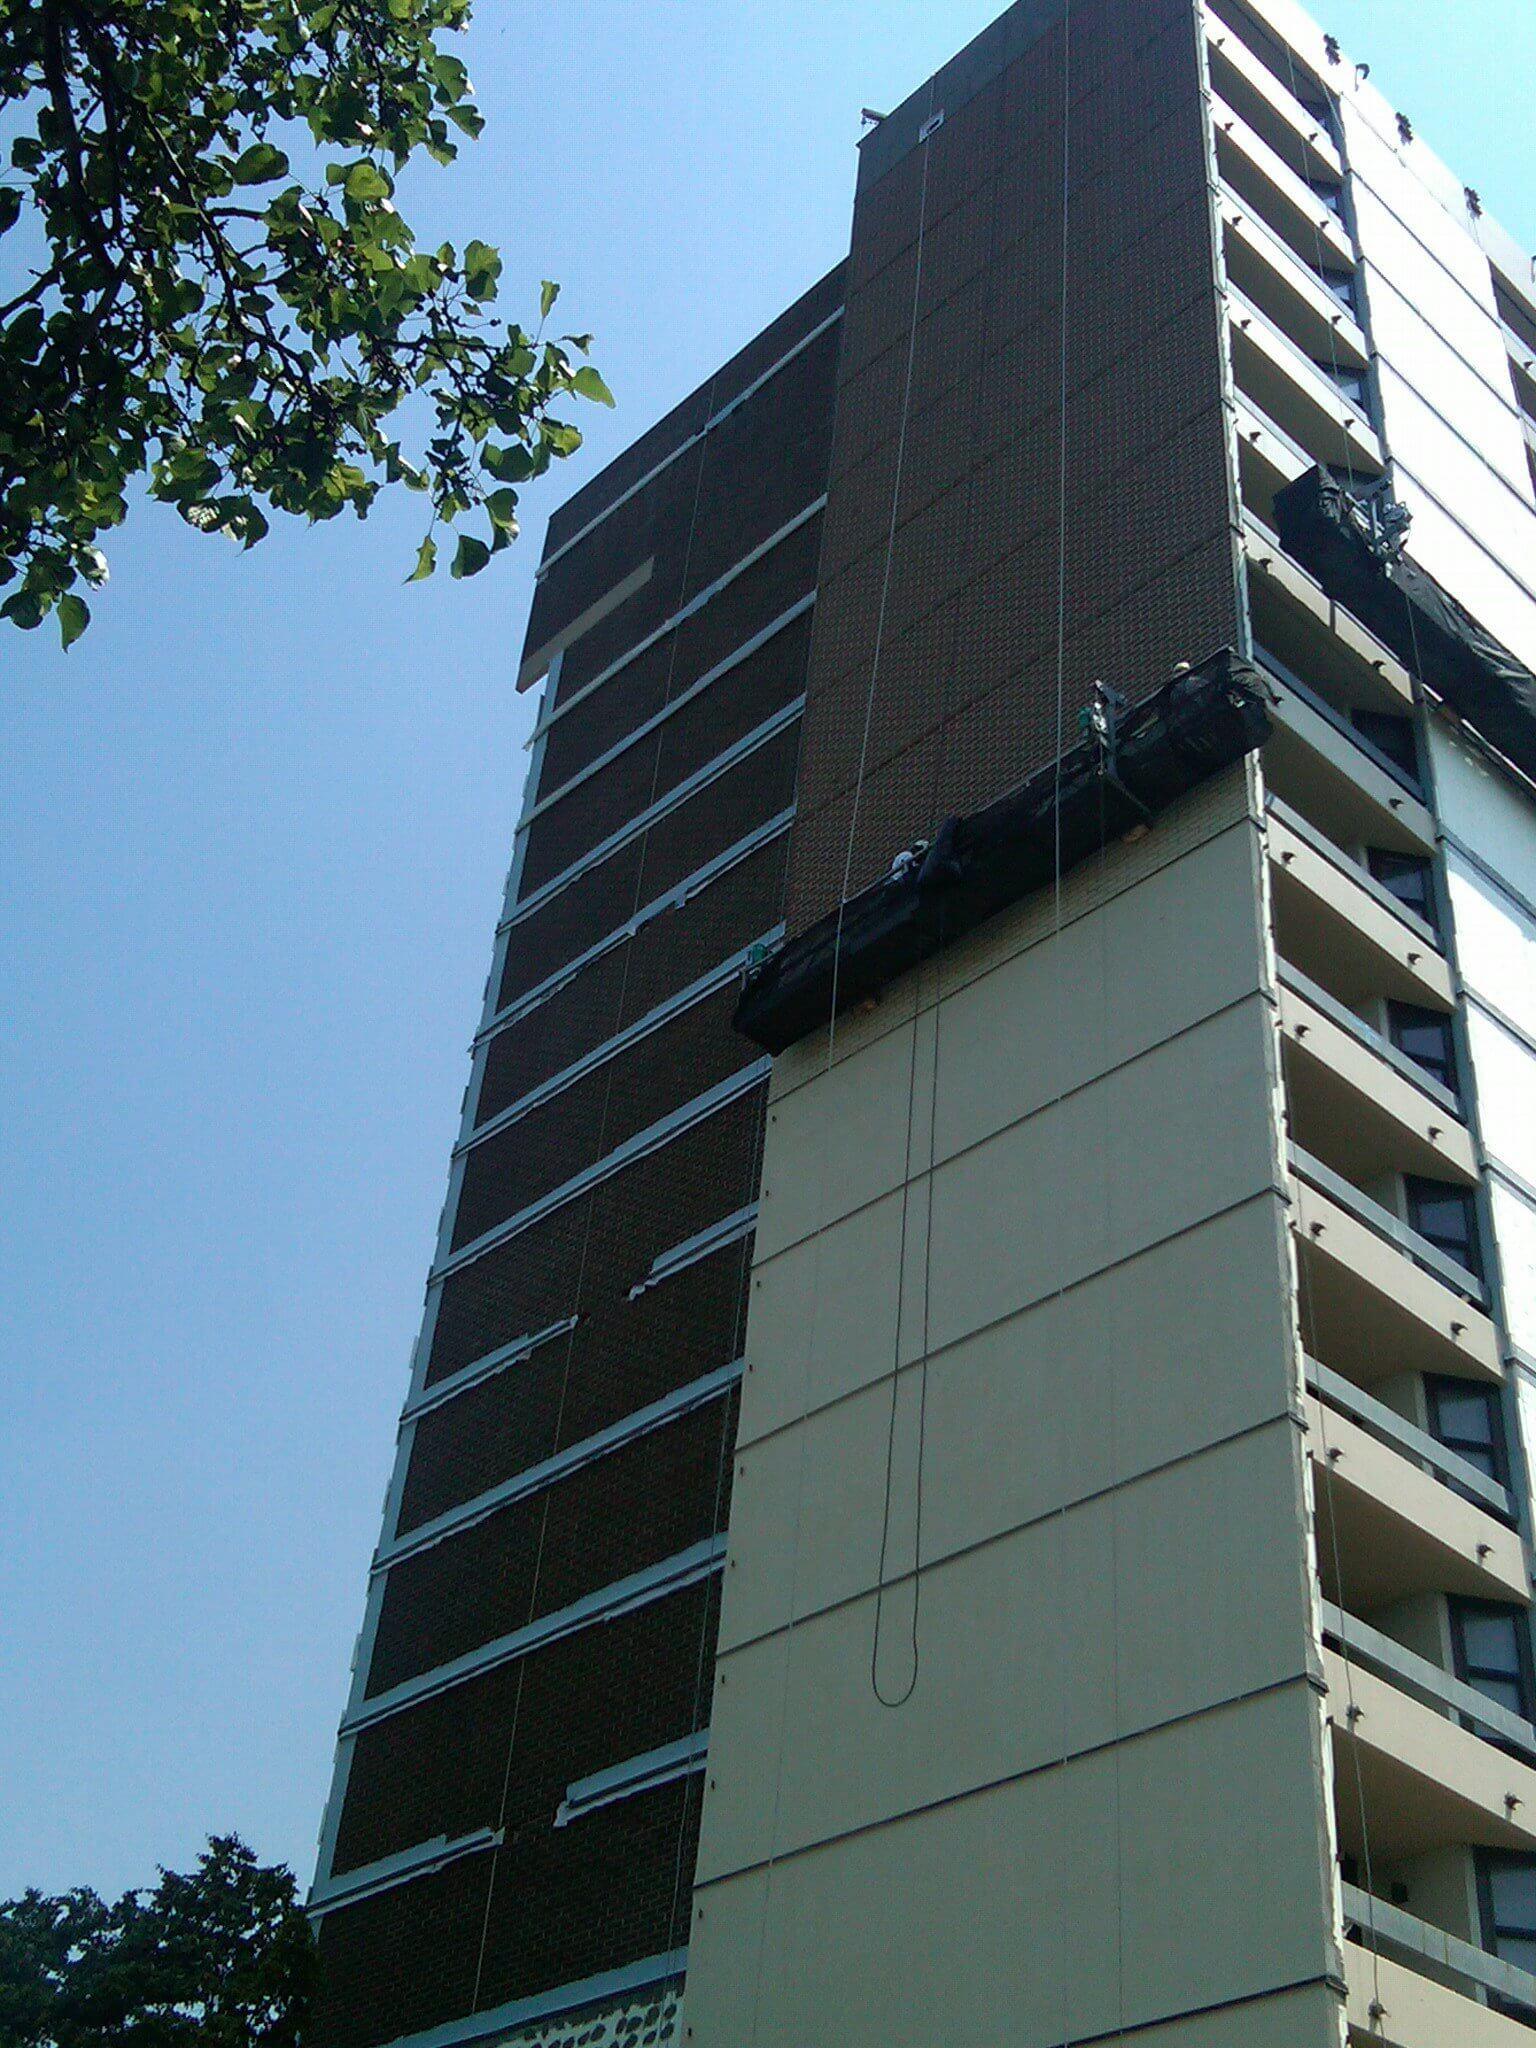 Bradleigh Applications, Inc. construction at Wyman House